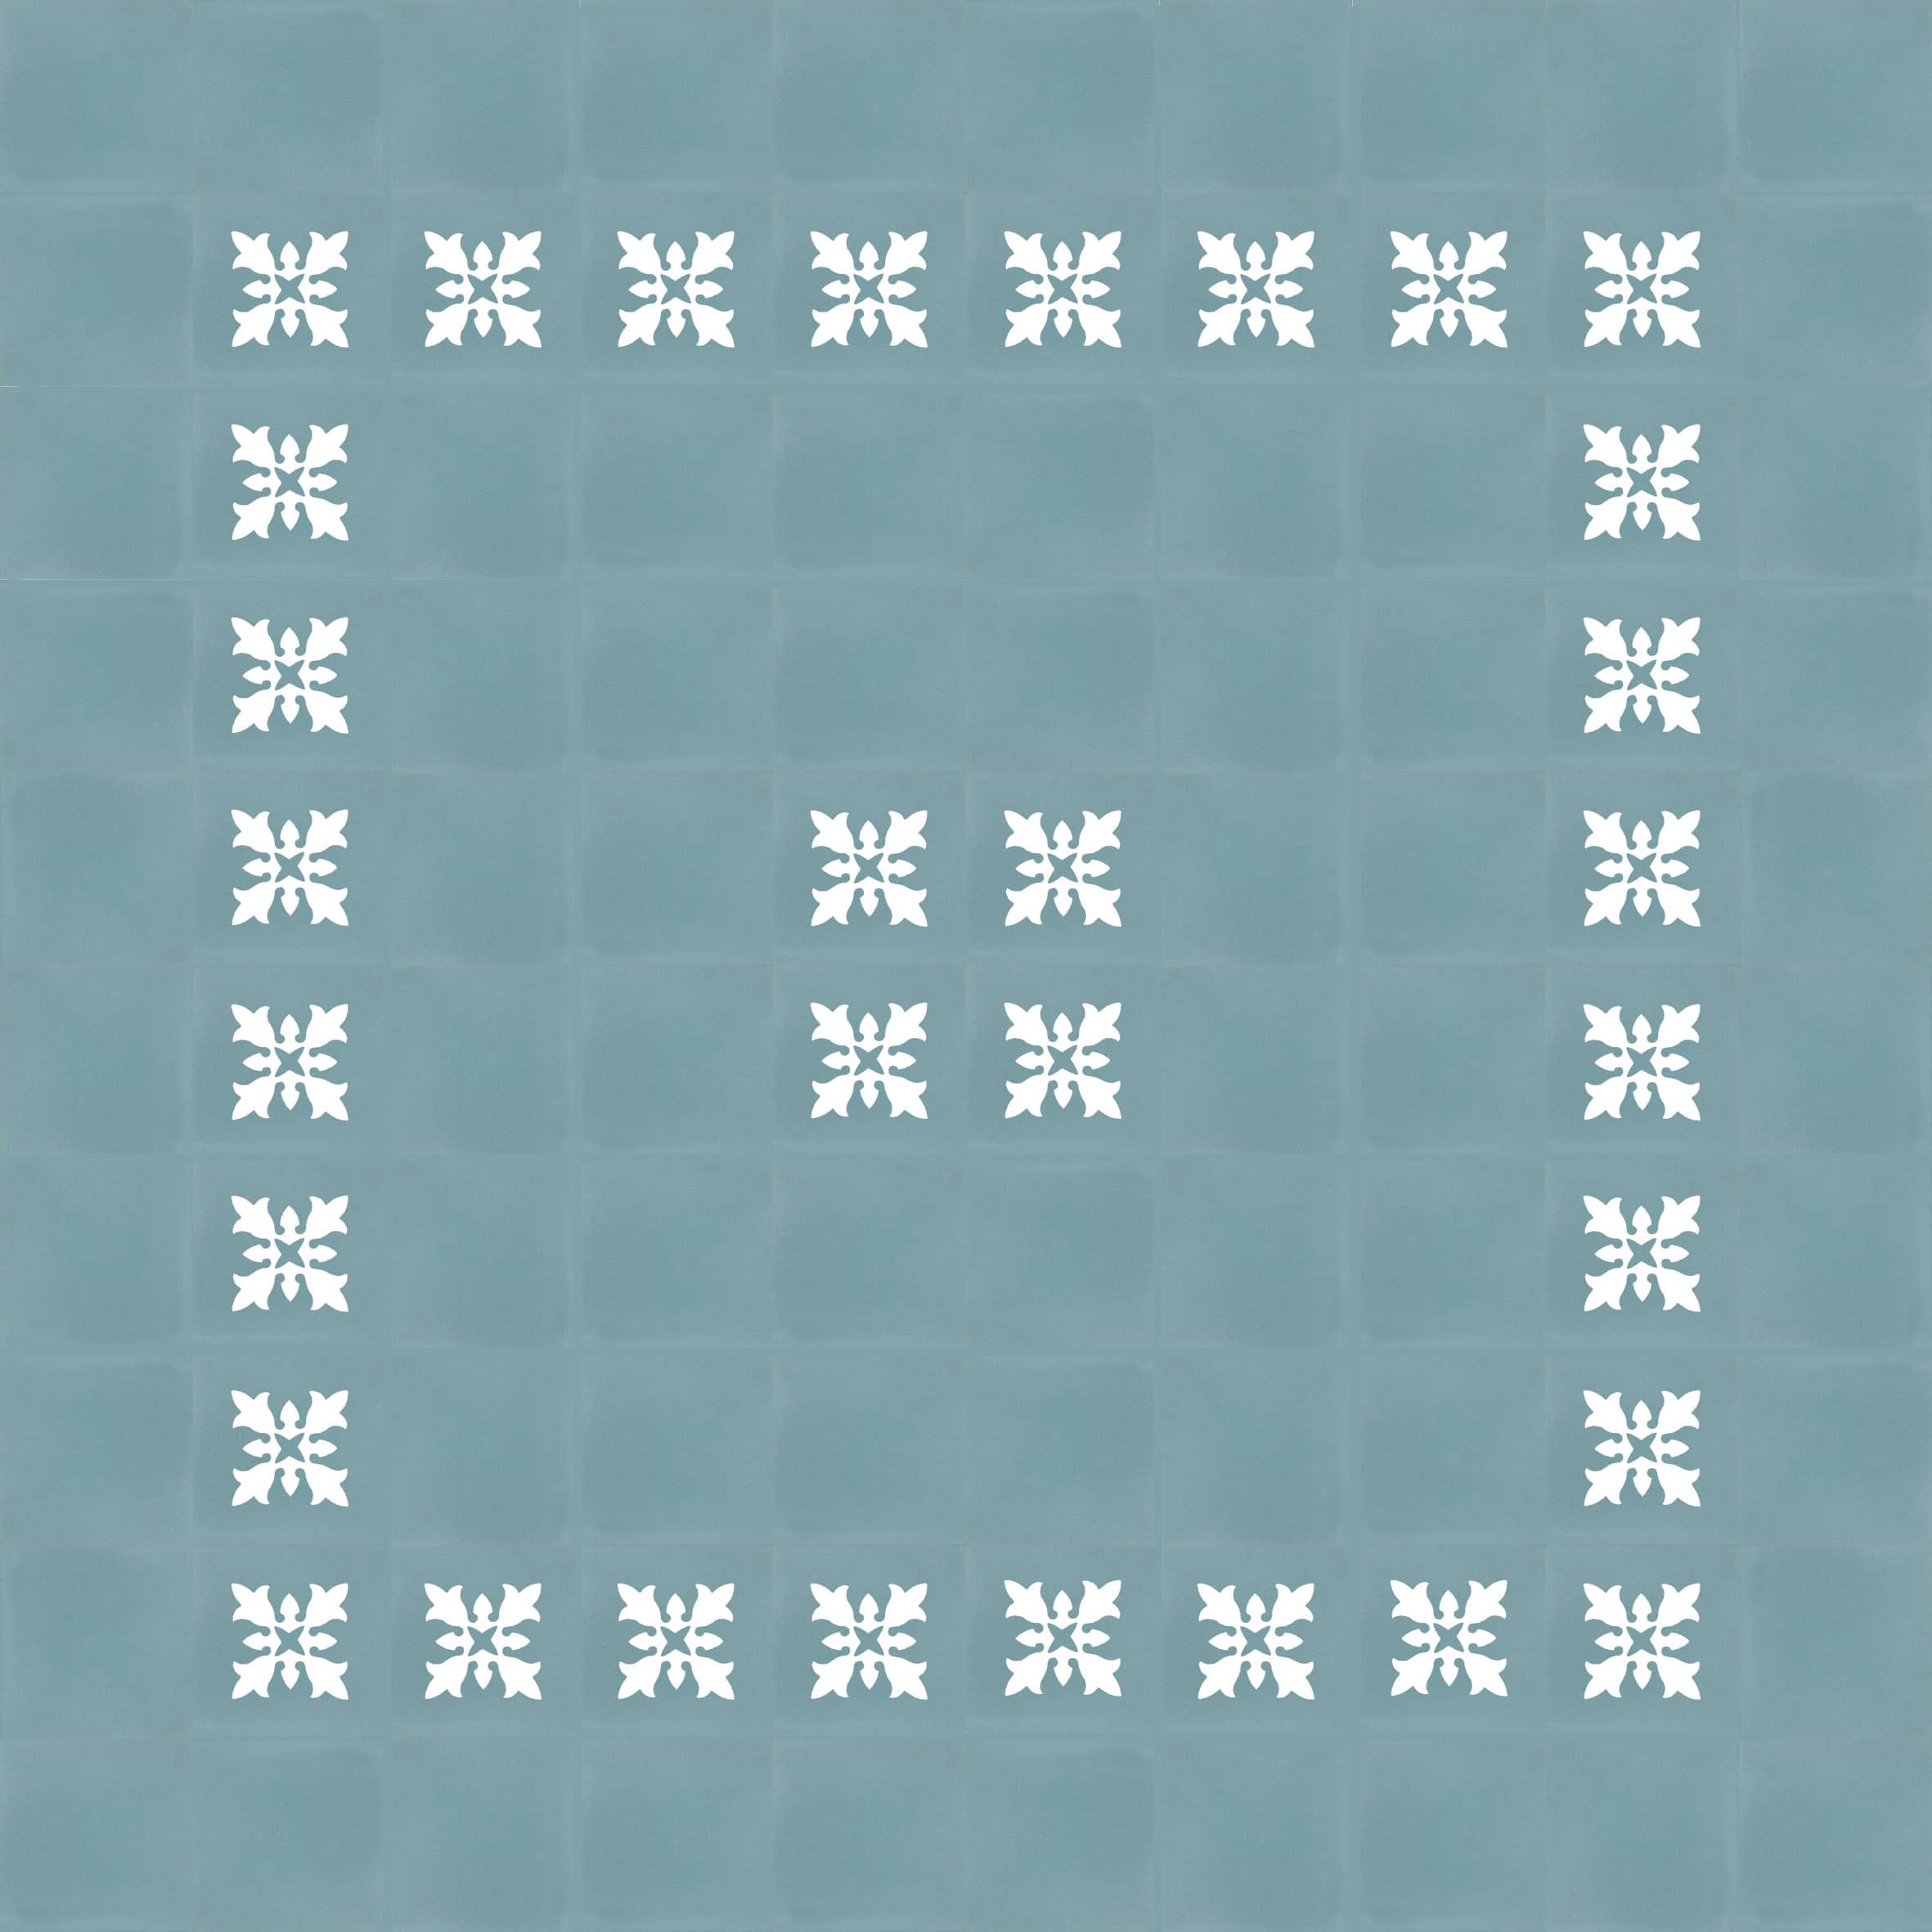 zementfliesen-verlegemuster-nummer-10951-viaplatten | 10951